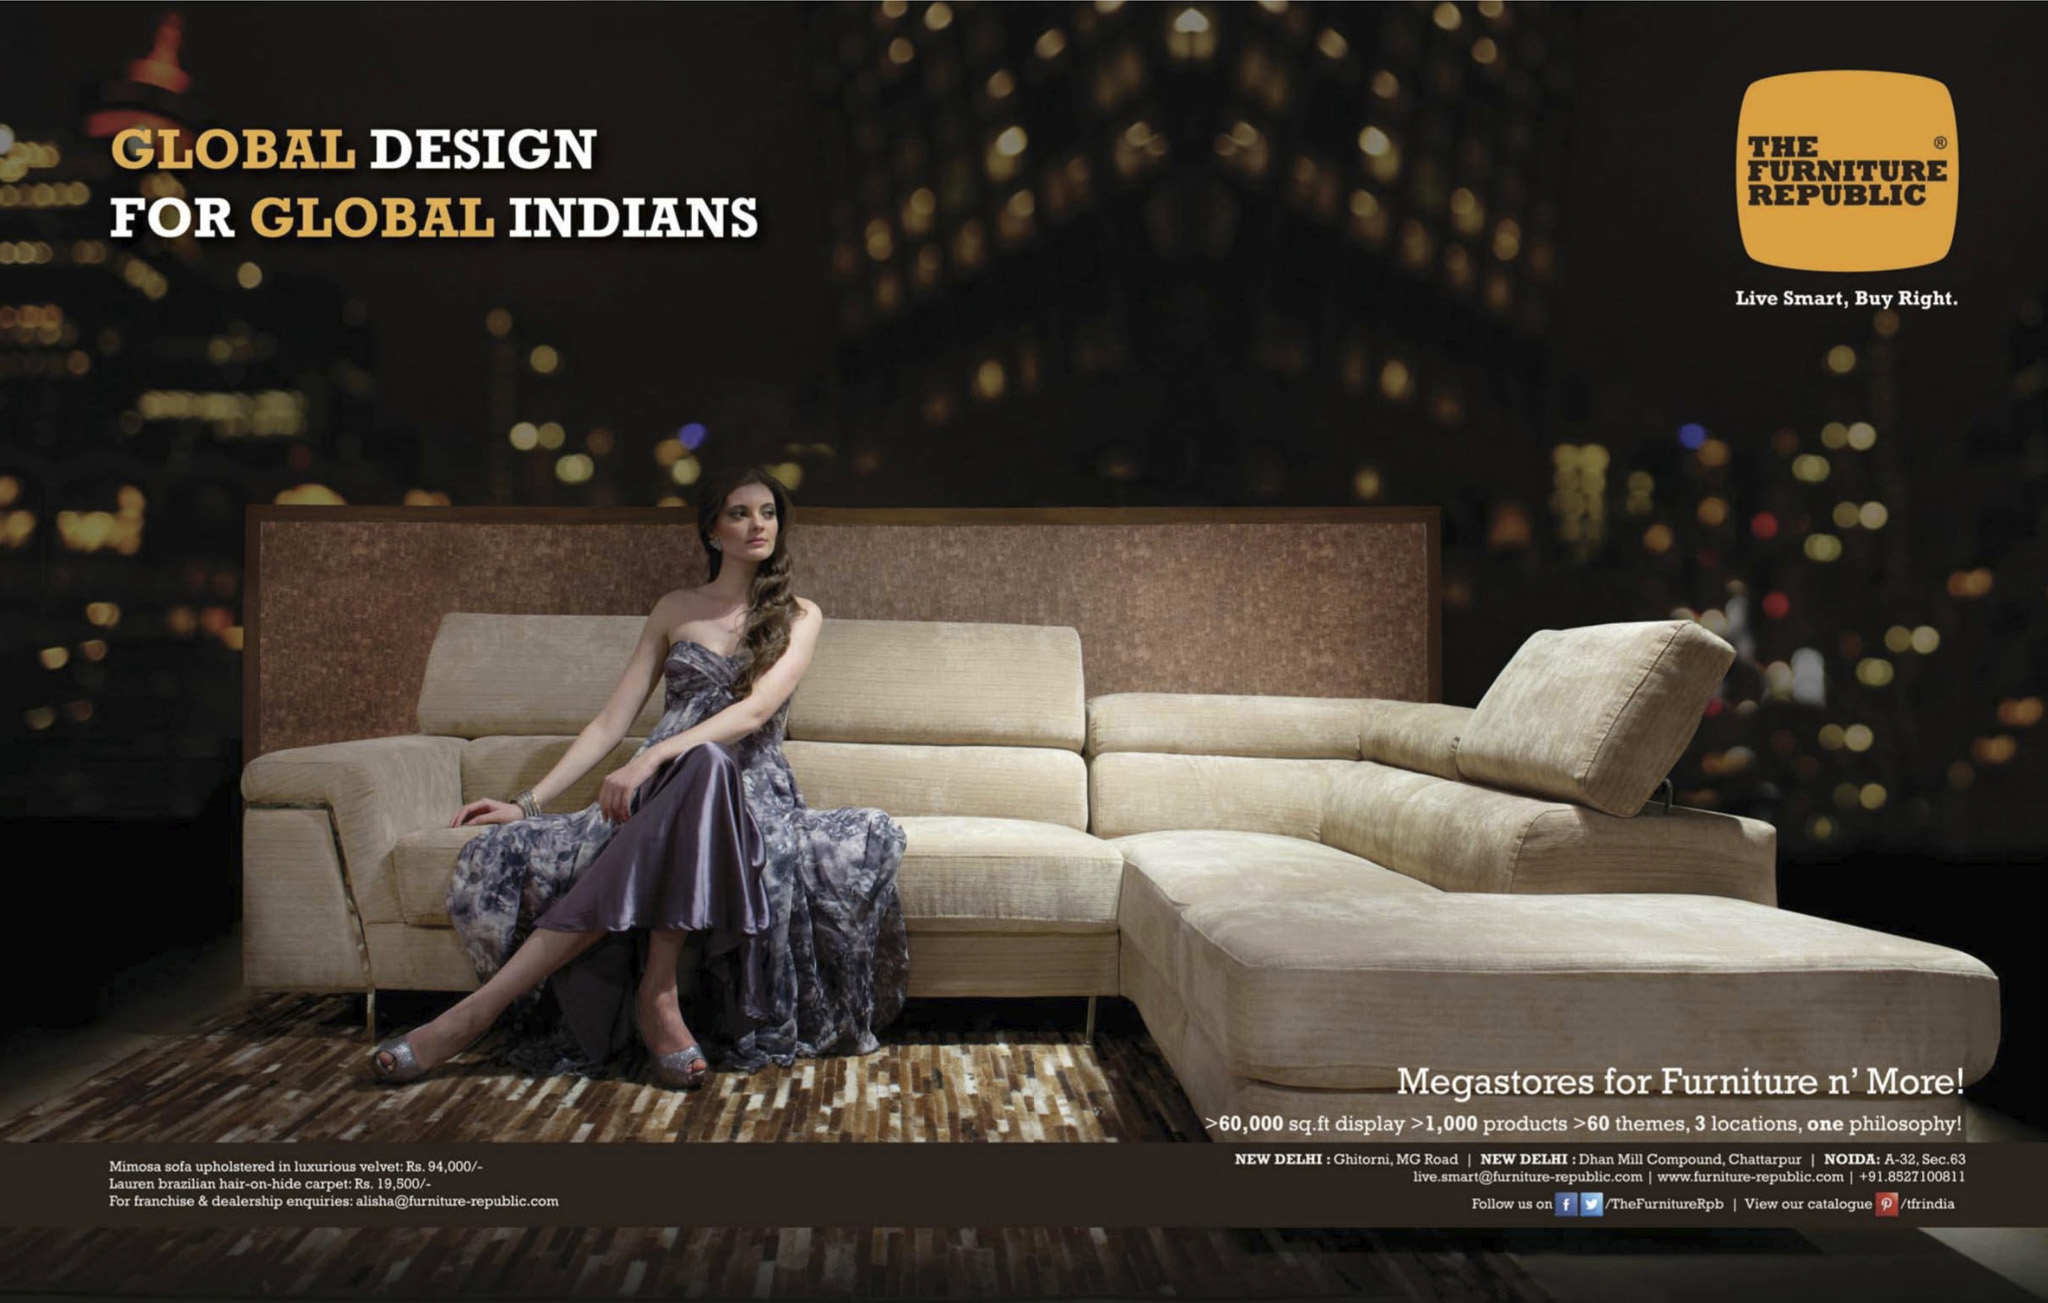 the furniture republic aditya mendiratta 1